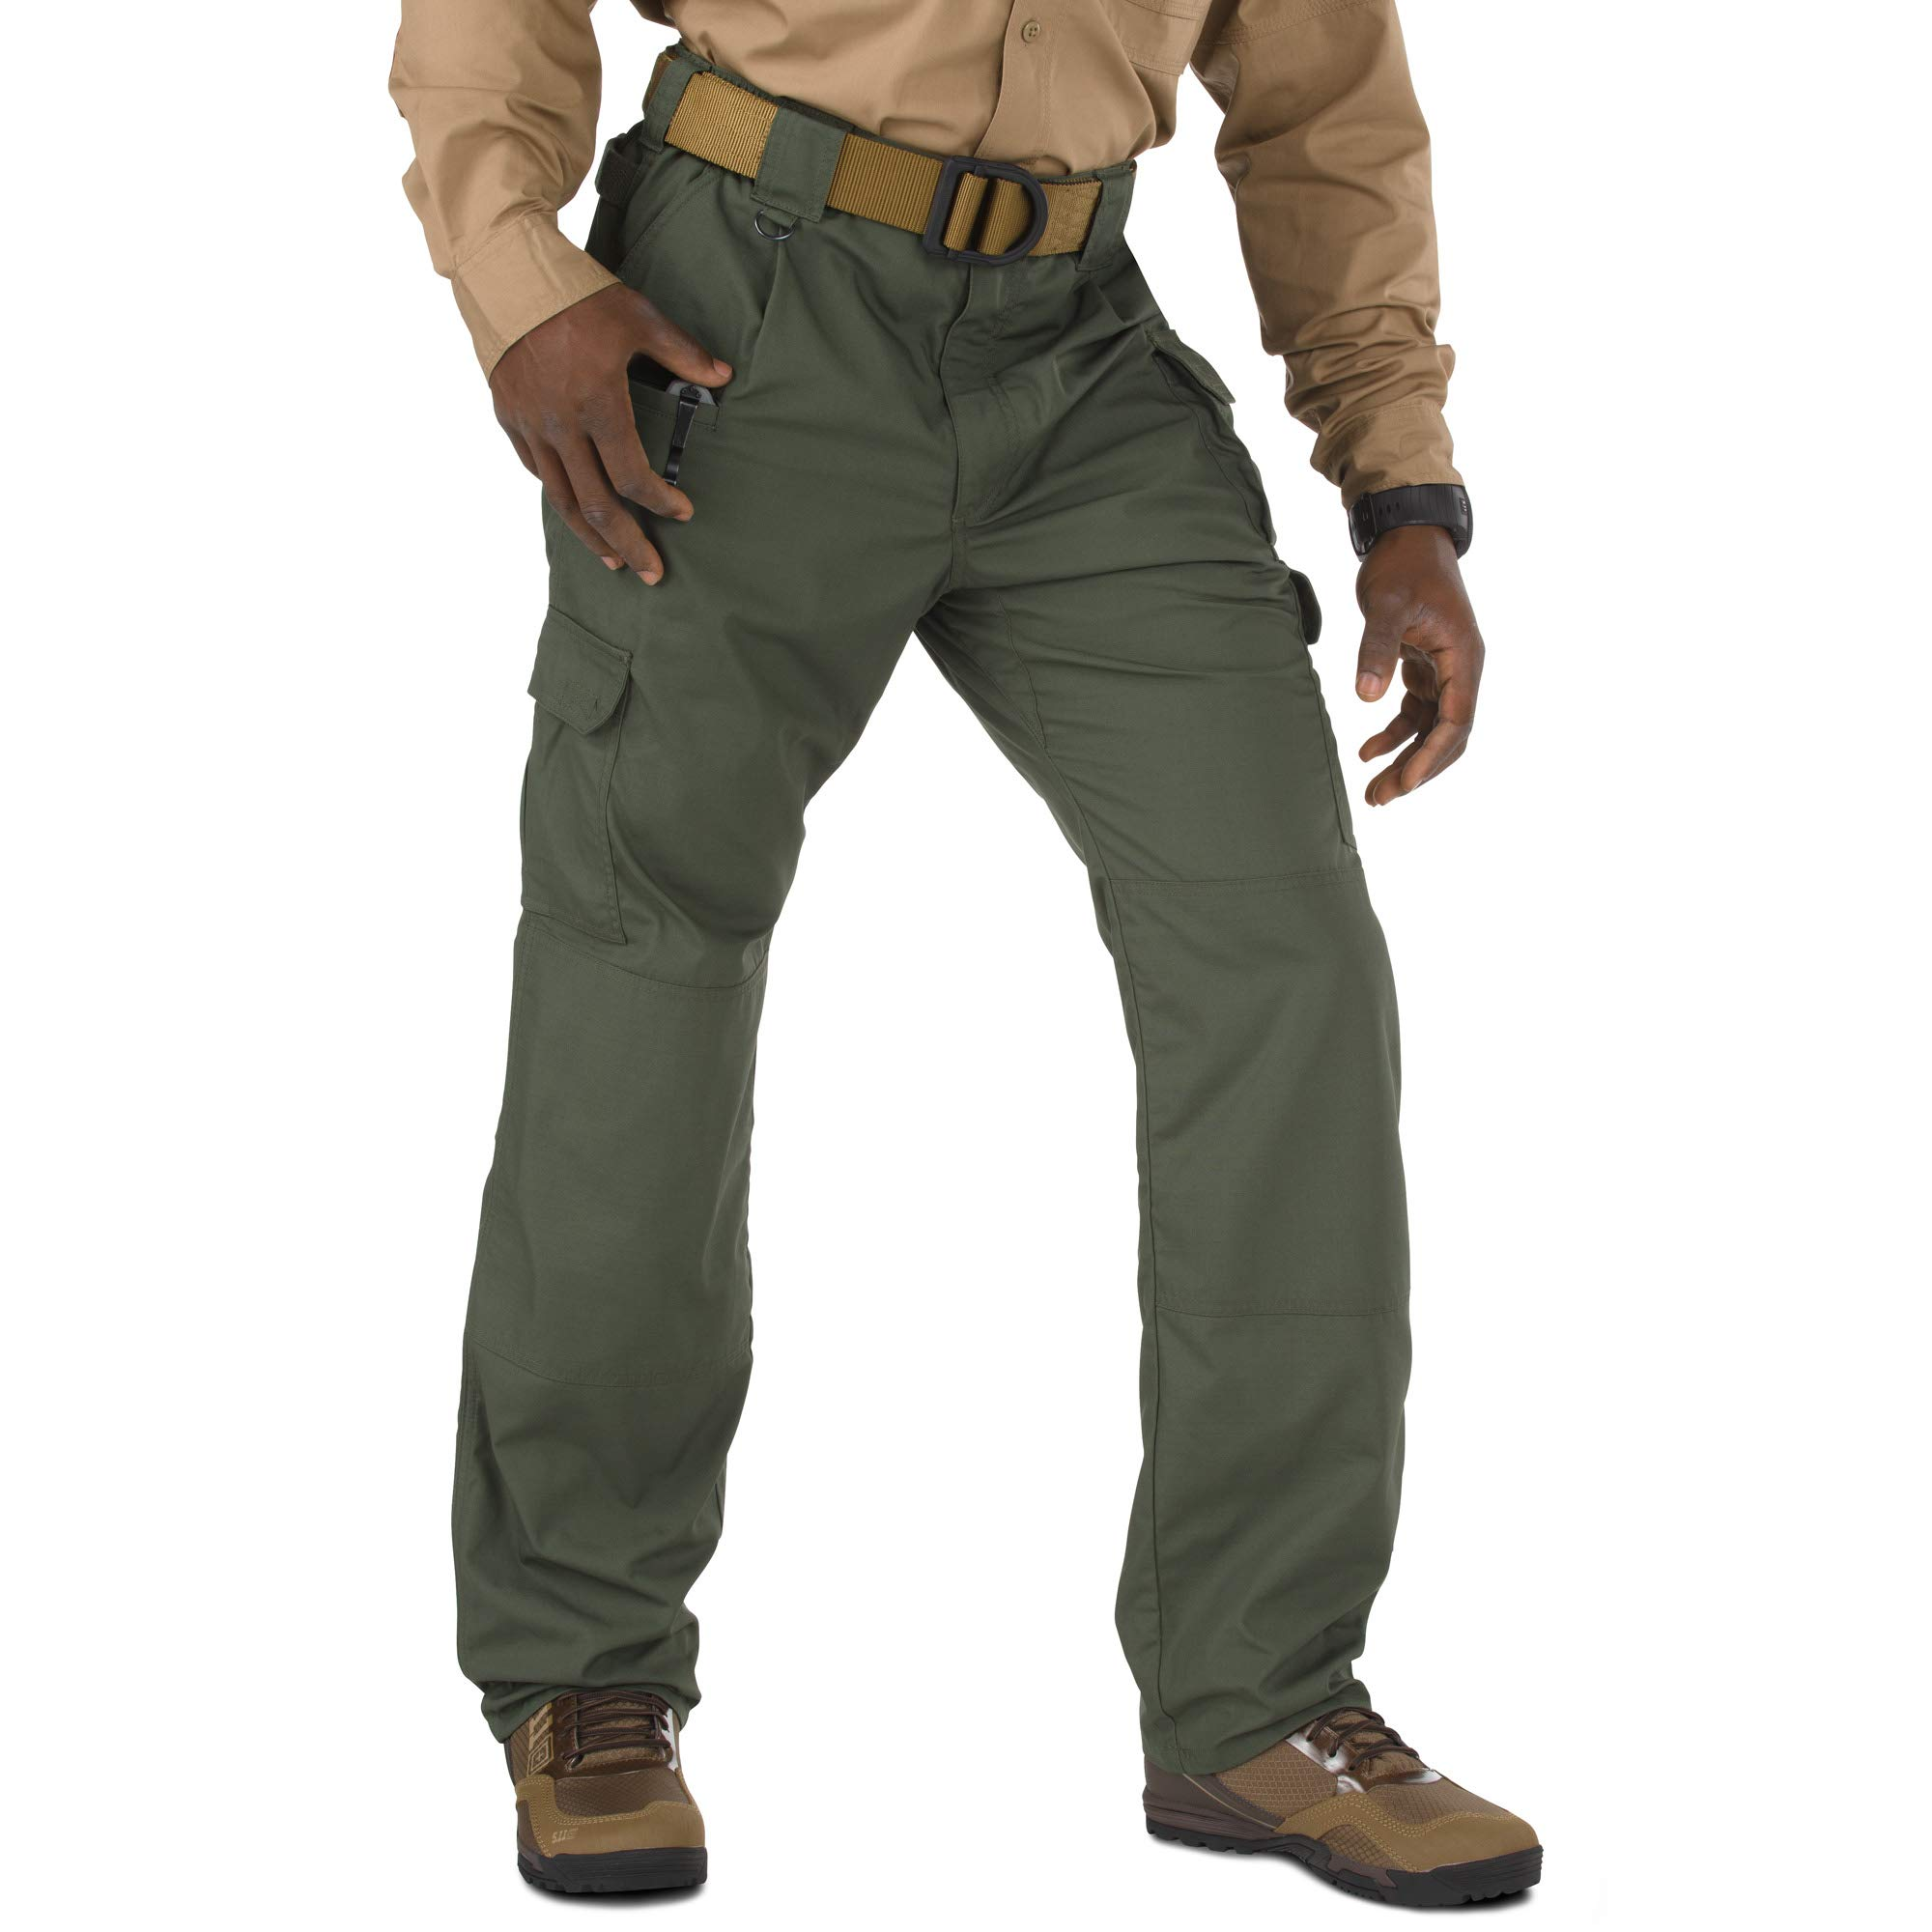 5.11 Men's Taclite Pro Tactical Pants, Style 74273, TDU Green, 46W Unhemmed